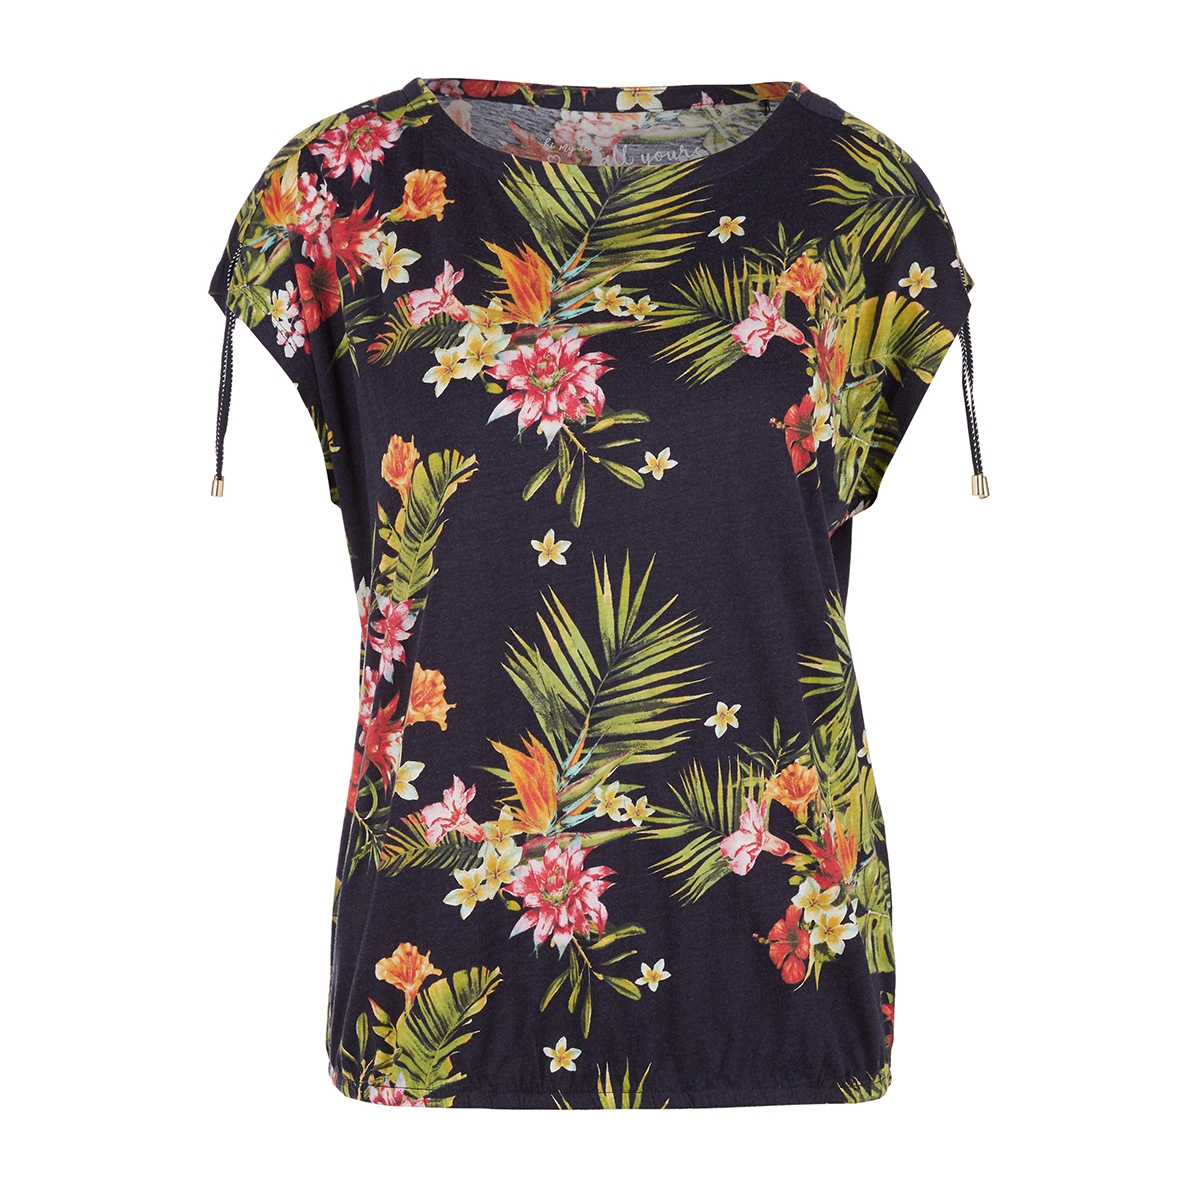 t shirt 04899325114 s.oliver t-shirt 59c8